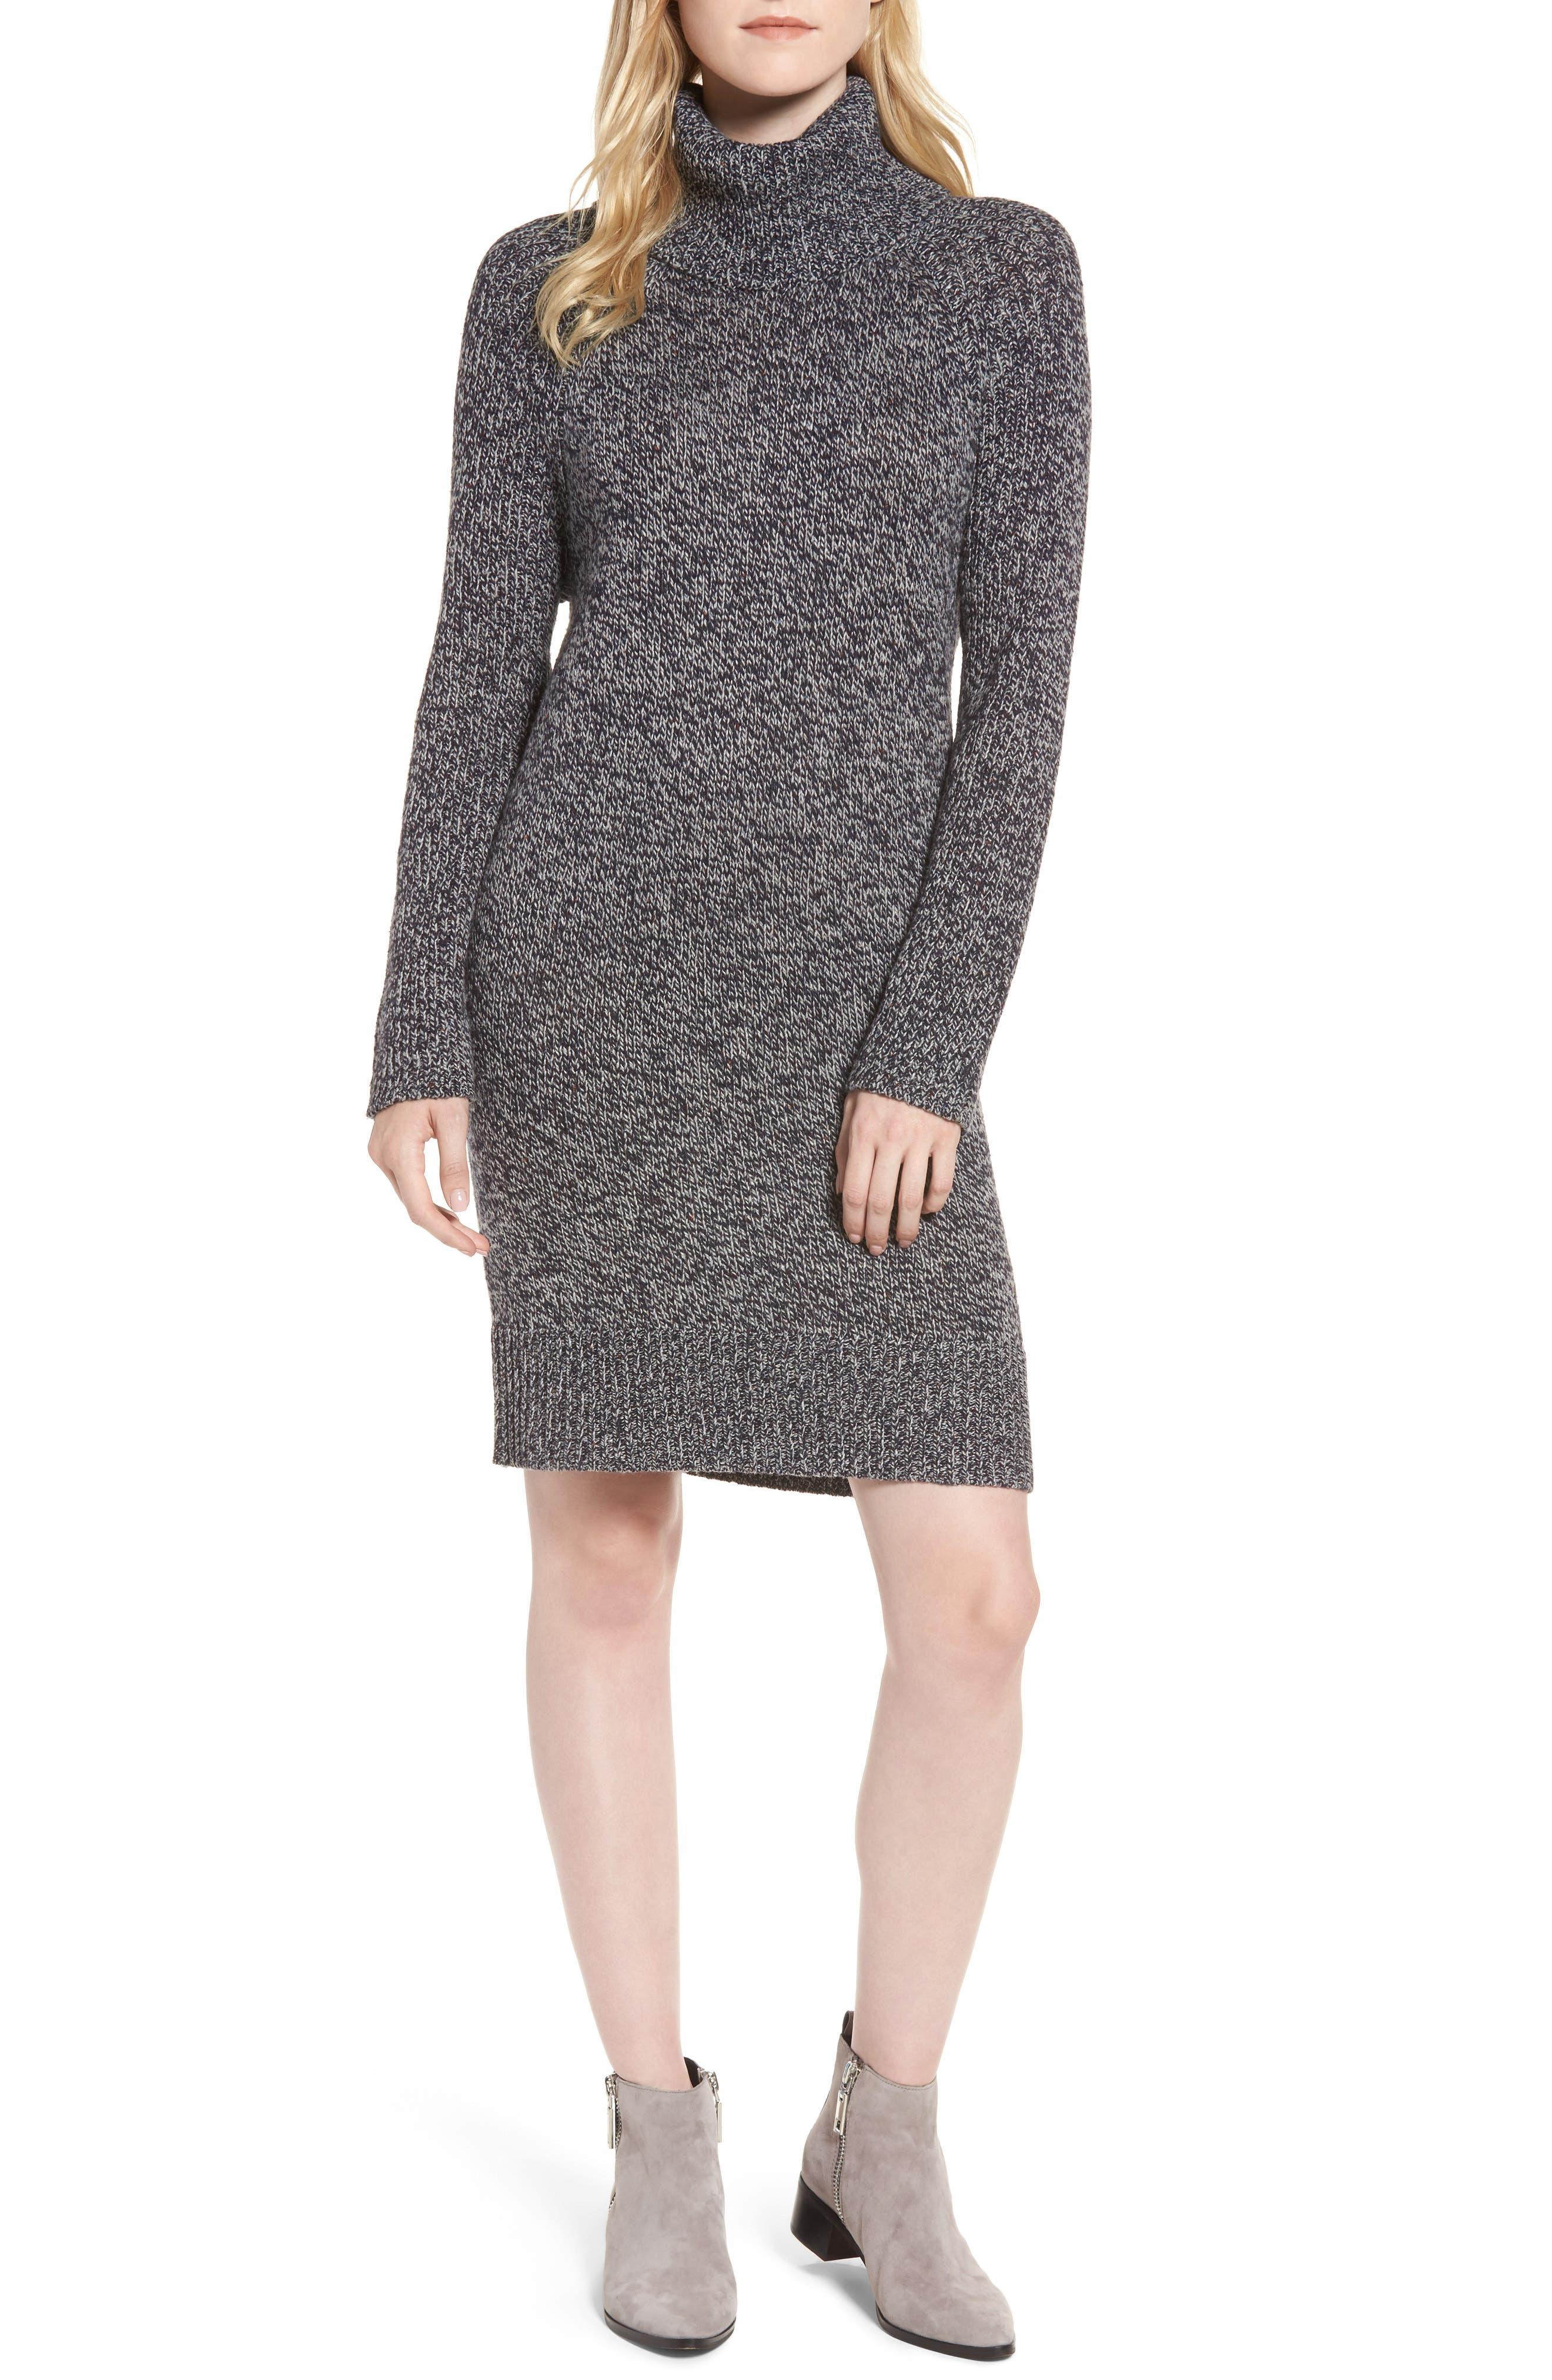 Turtleneck Sweater Dress,                         Main,                         color, Navy Grey Heather Neppy Marl